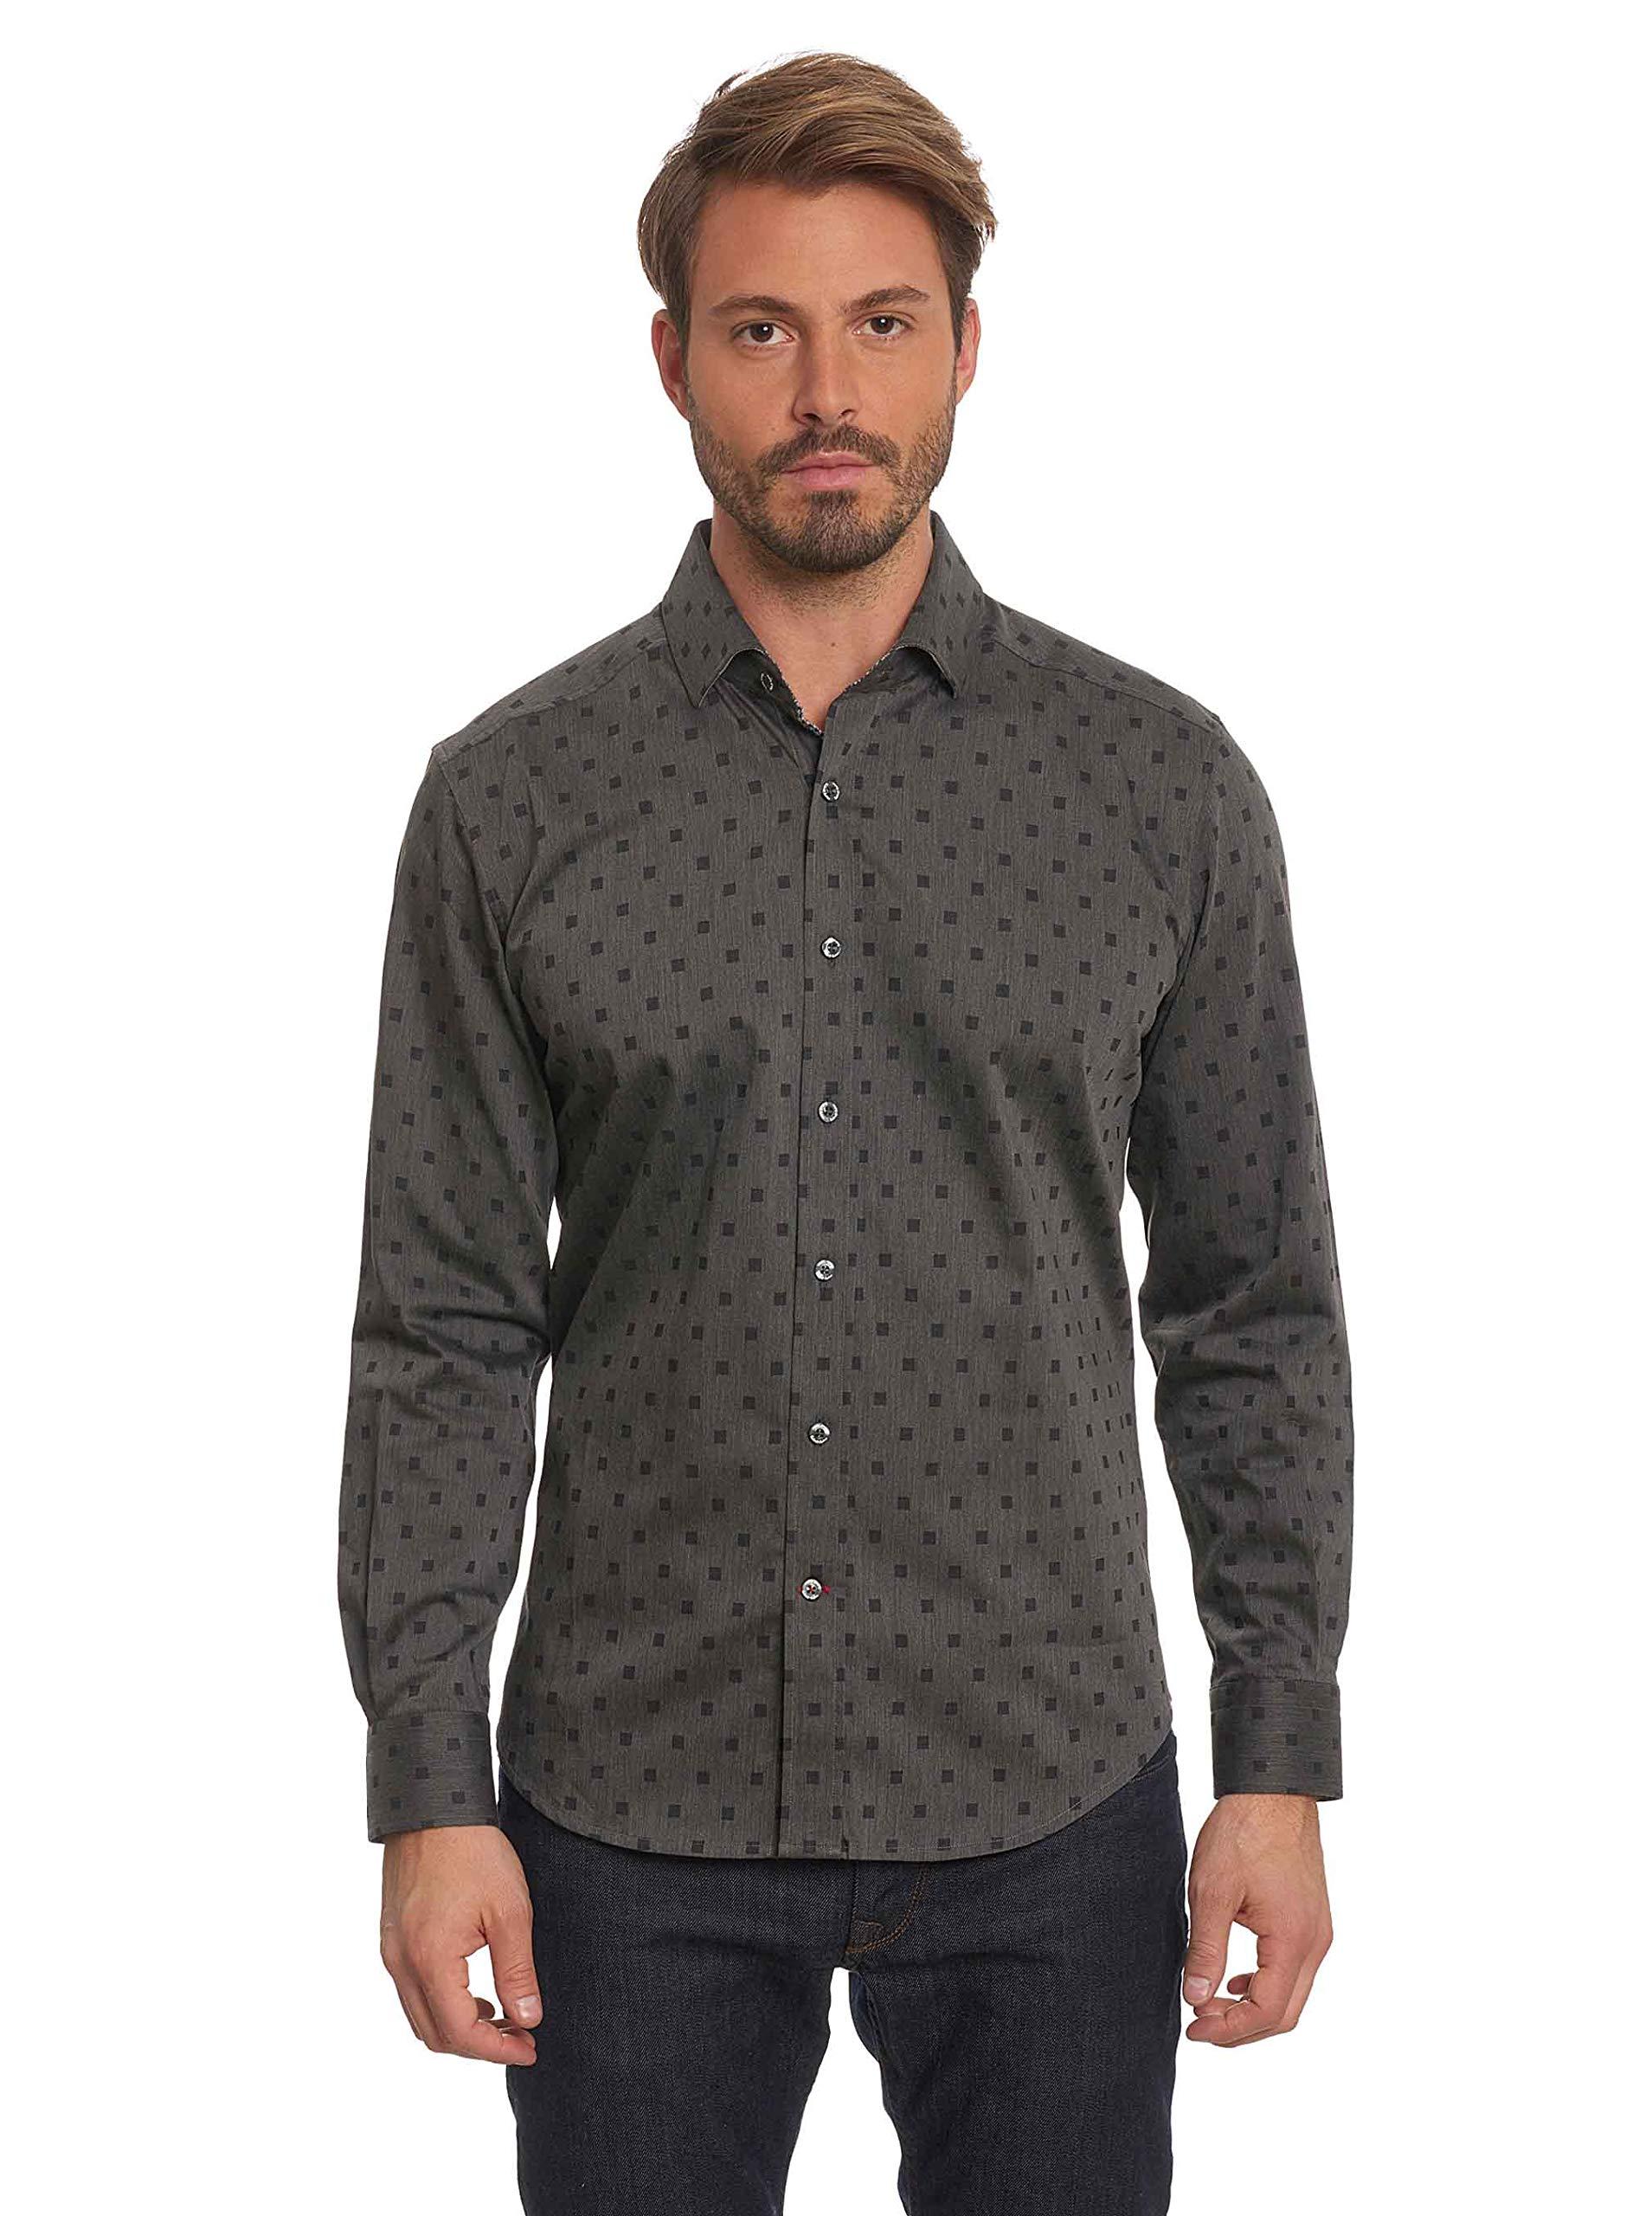 Robert Graham Gabe Long Sleeve Printed Woven Sport Shirt Big and Tall Black 4Xlarge